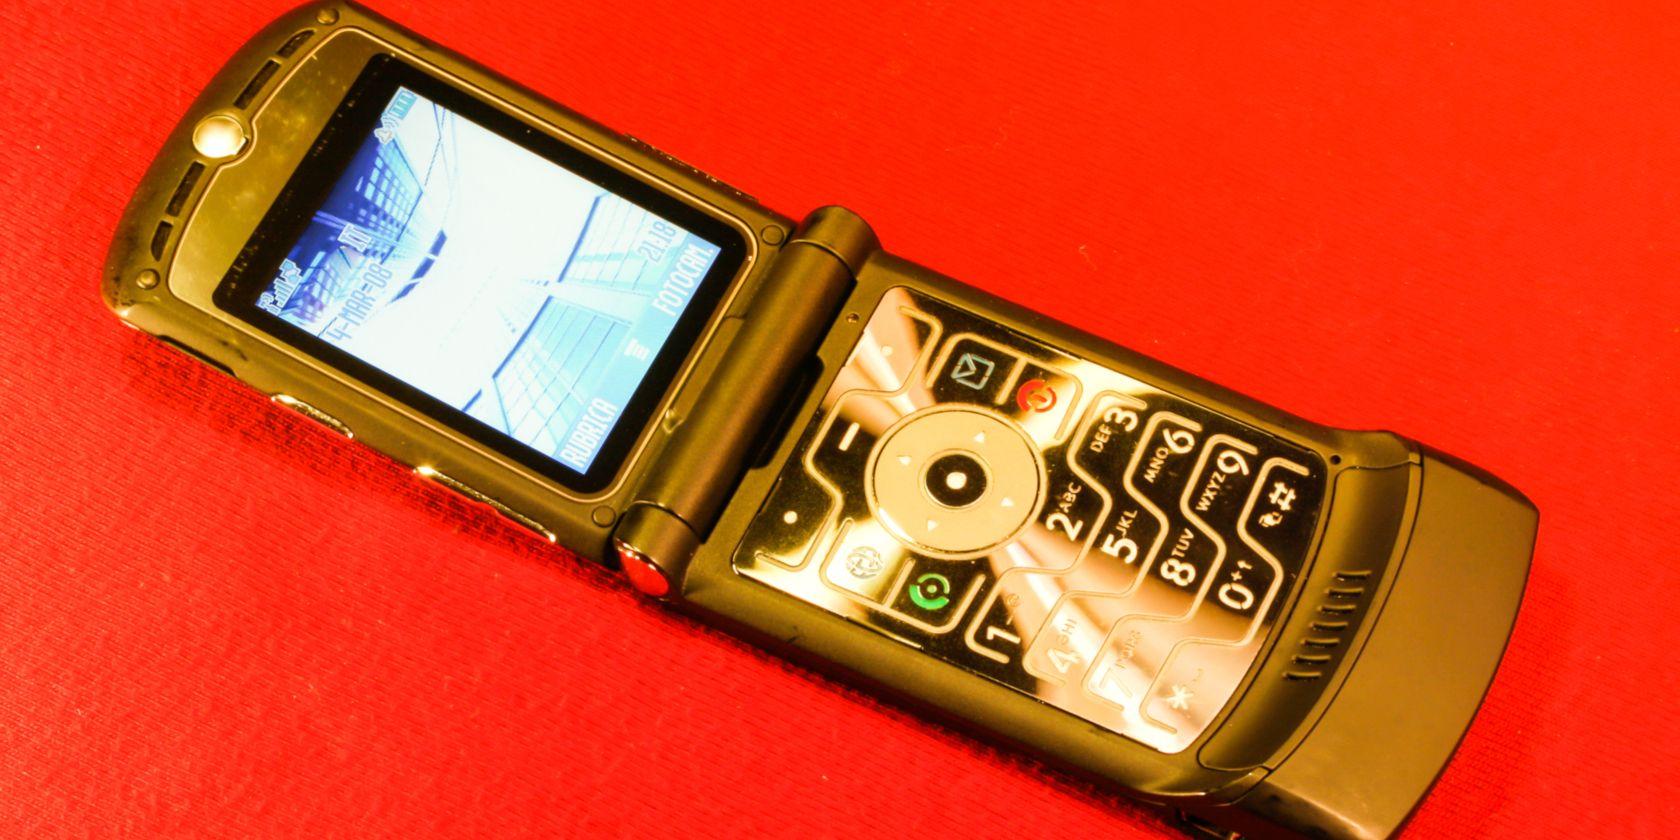 A motorola Razr phone on a red background